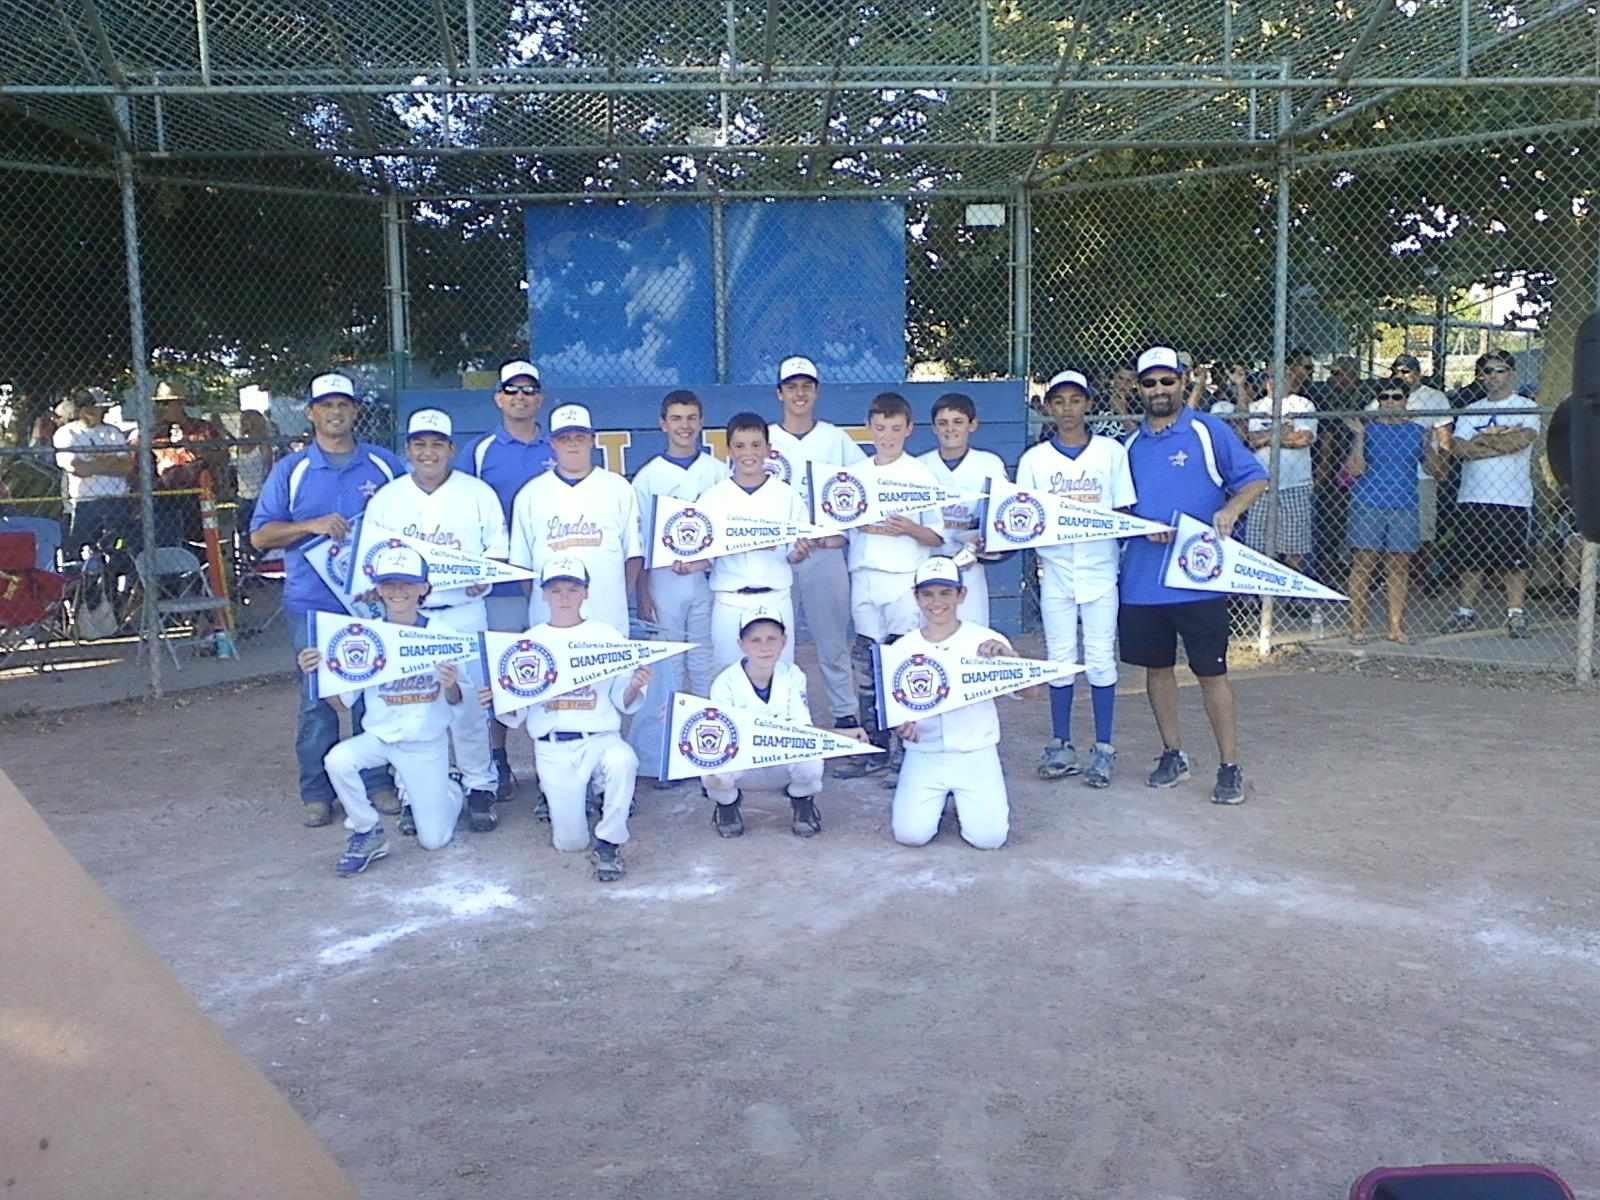 2013 LL Champions